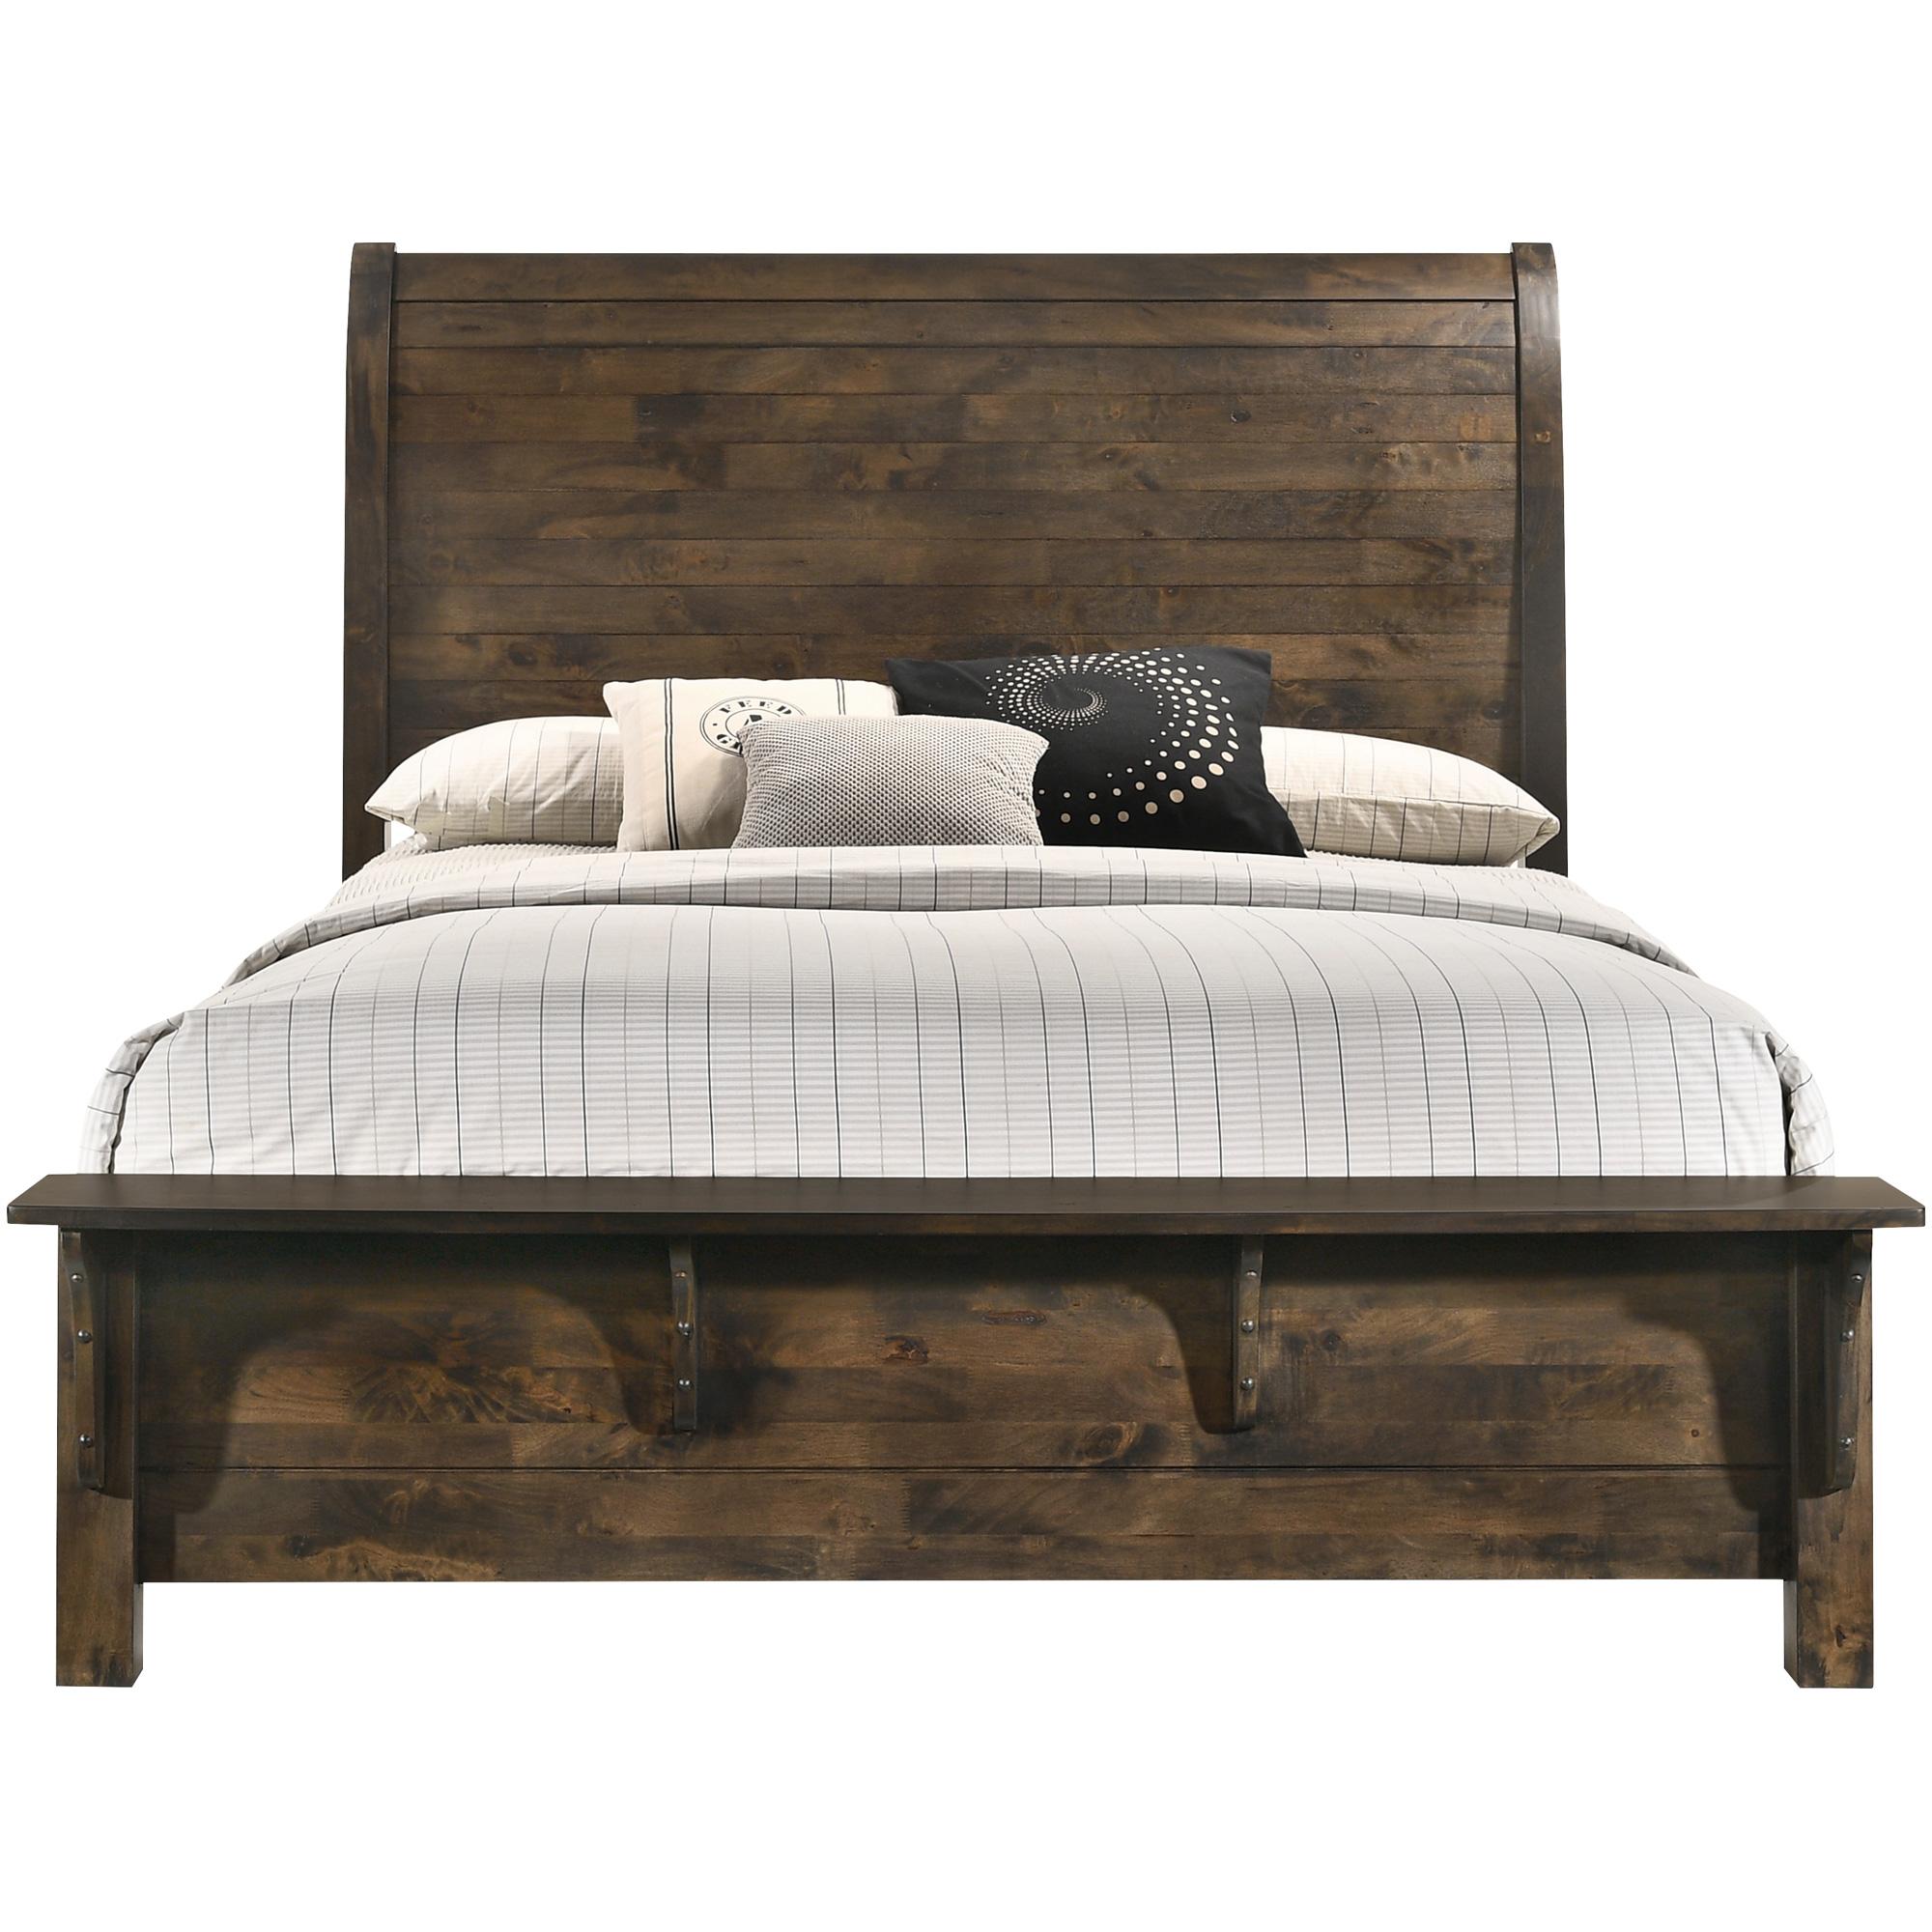 New Classic | Blue Ridge Rustic Gray King Bed